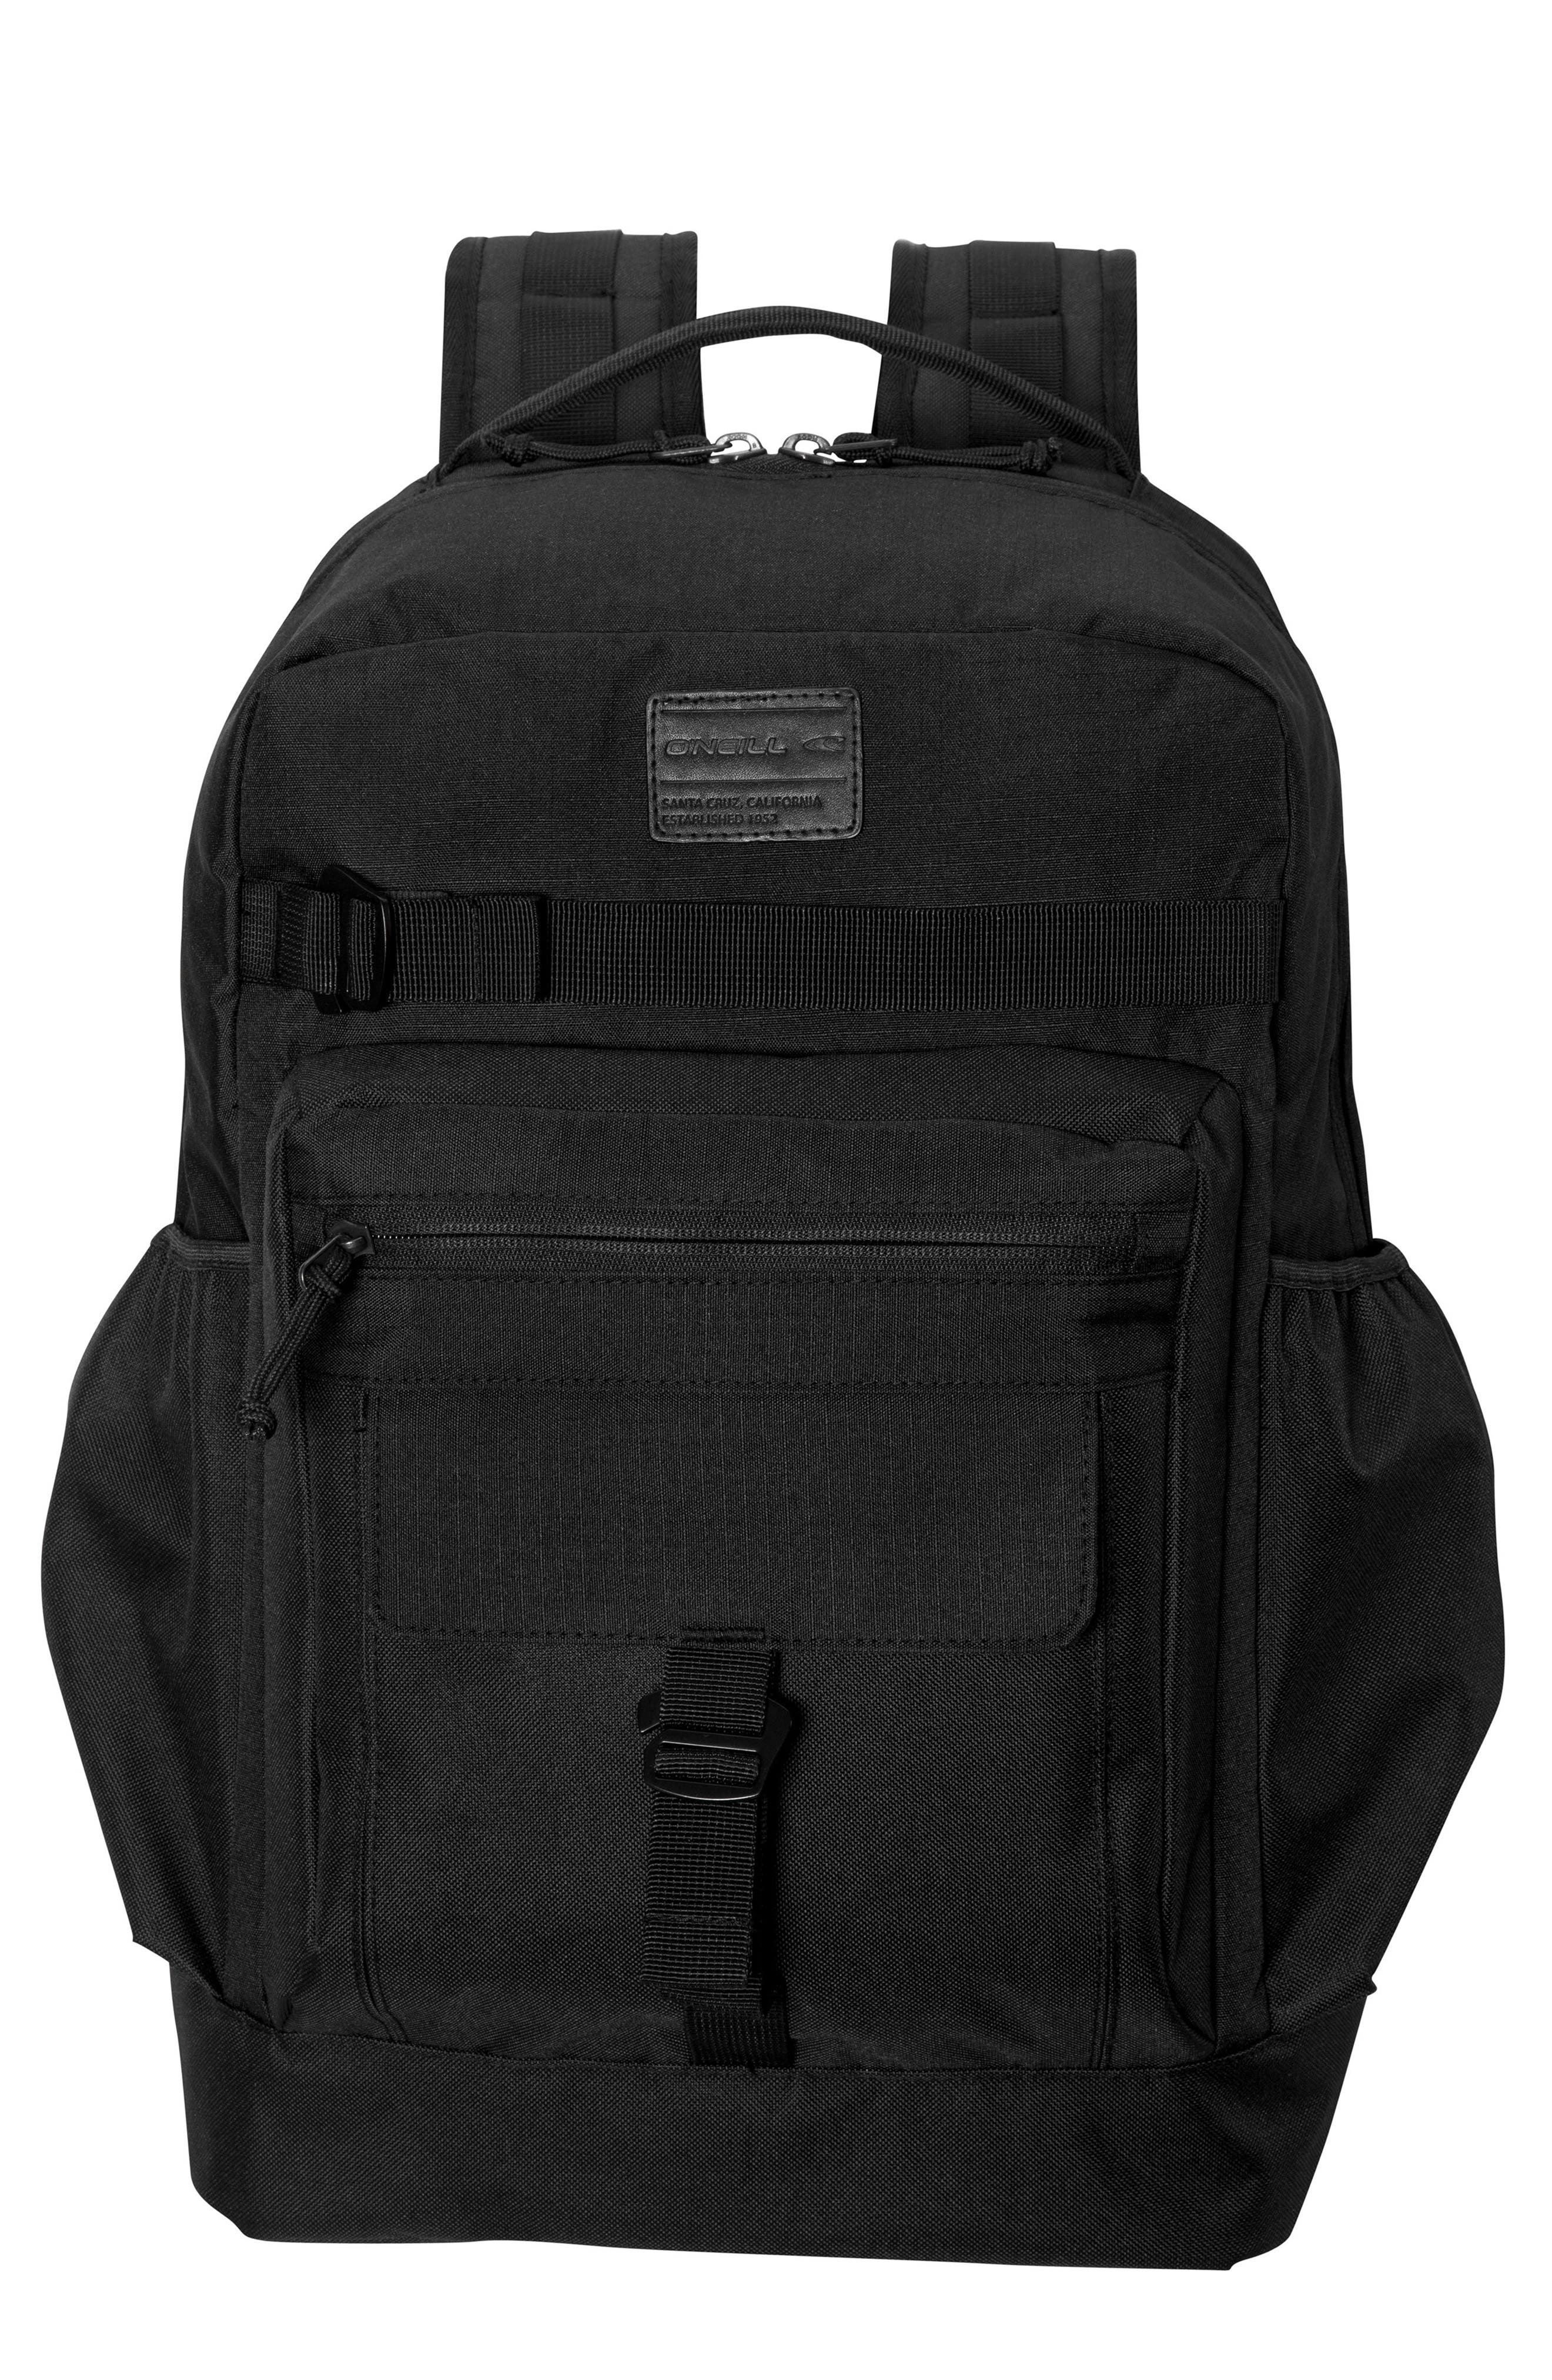 ONEILL Morro Backpack